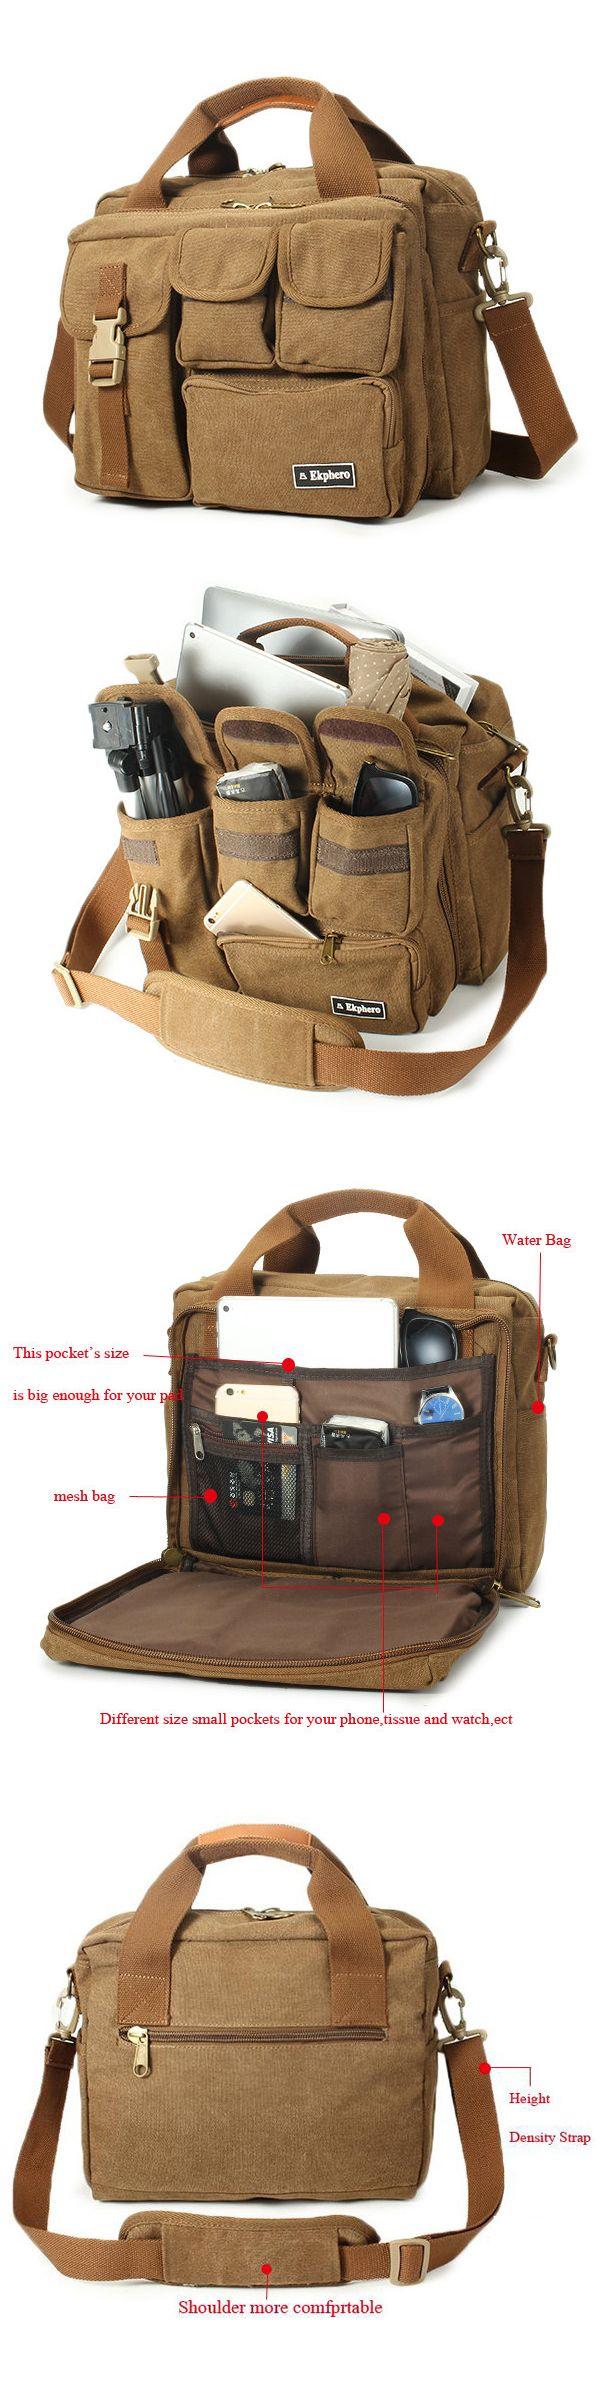 US$33.99 EKPHERO Men Large Capacity Canvas Crossbody Computer Bag Outdoor Casual Travel Tactical Bag Remarkable stories. Daily